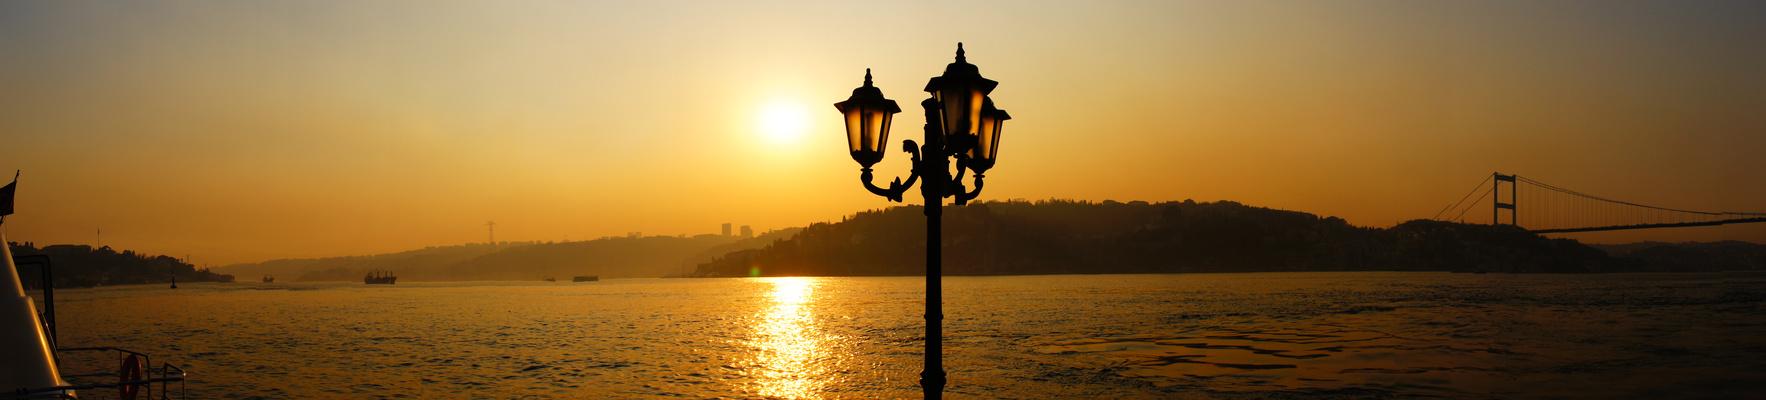 View on the Bosporus from Anadolu Hisari